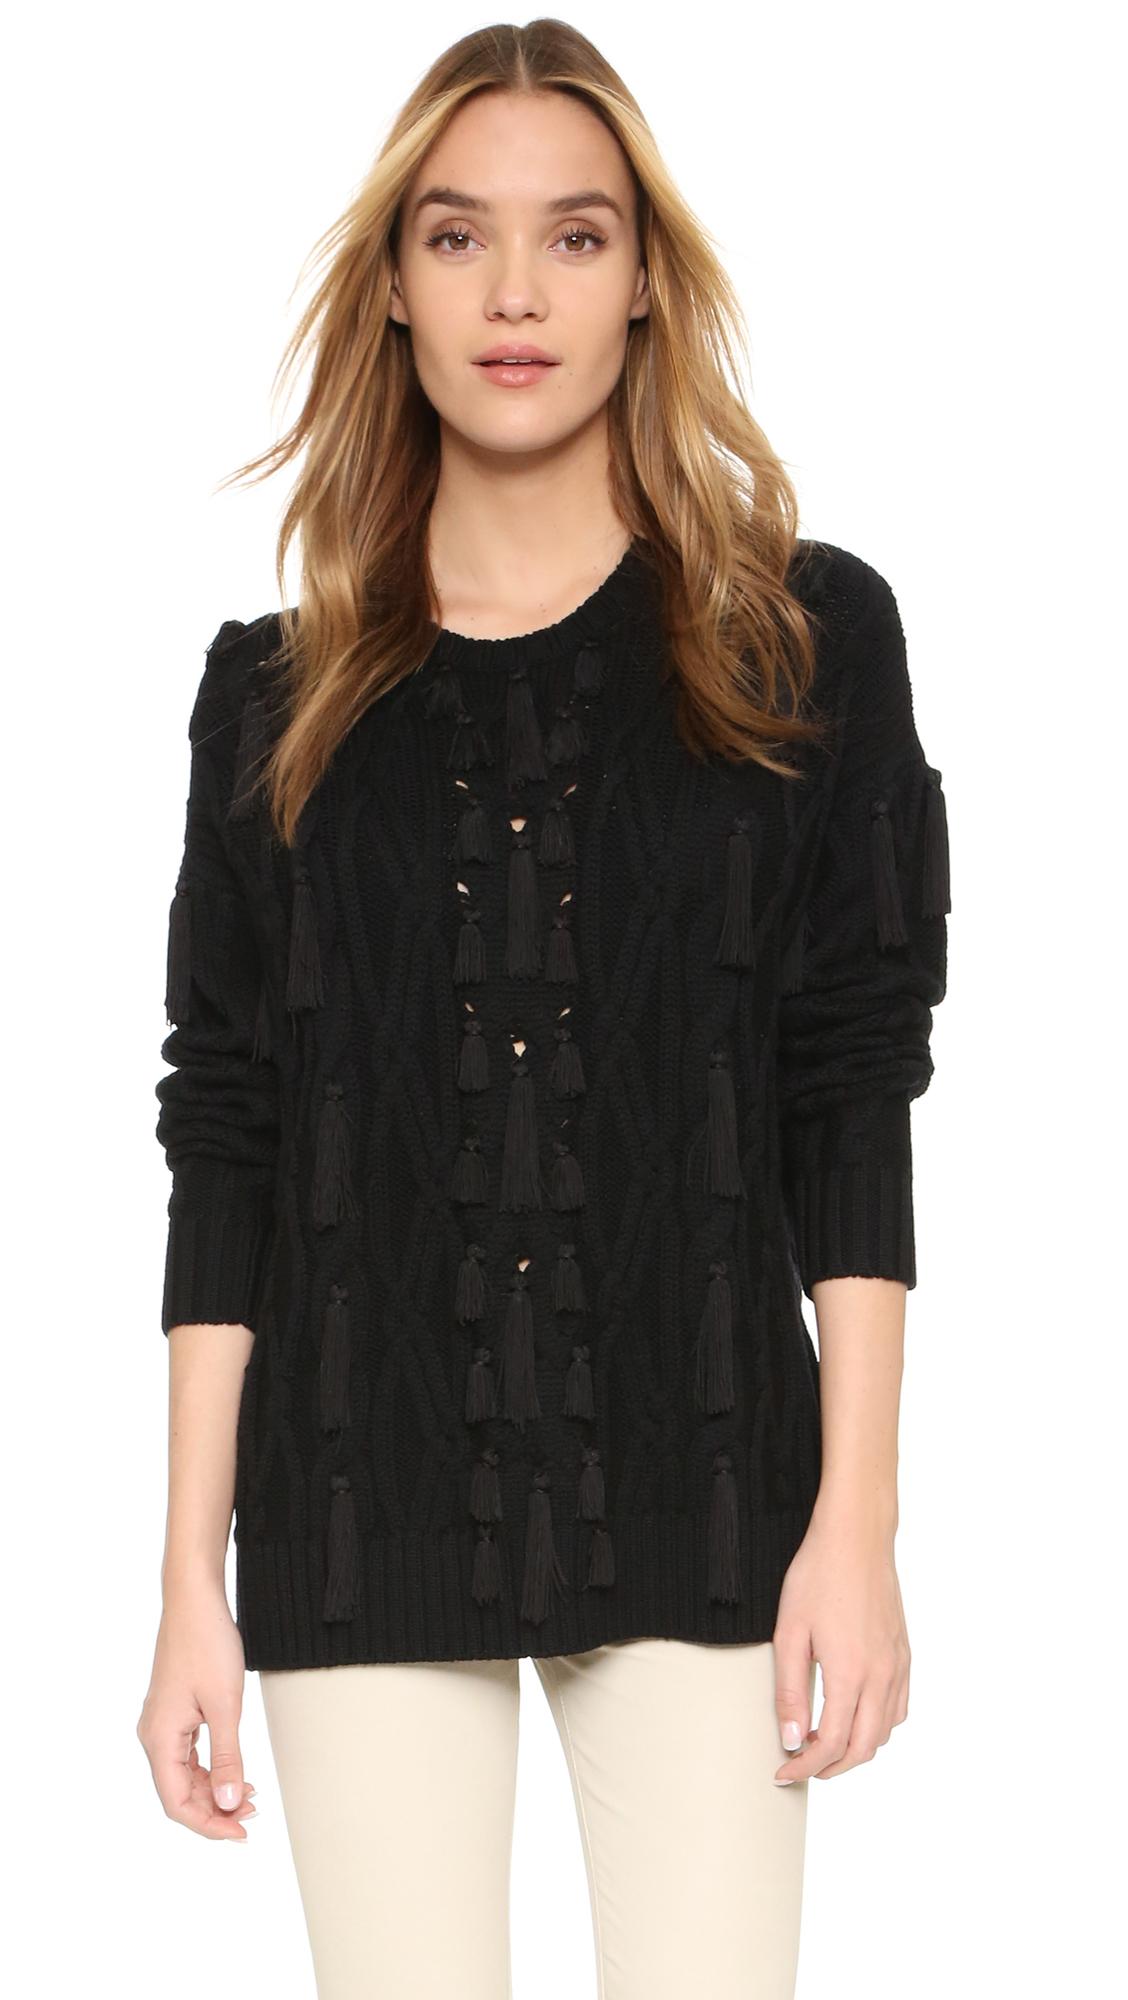 Lyst - Rachel Zoe Camrey Cable Tassel Sweater in Black